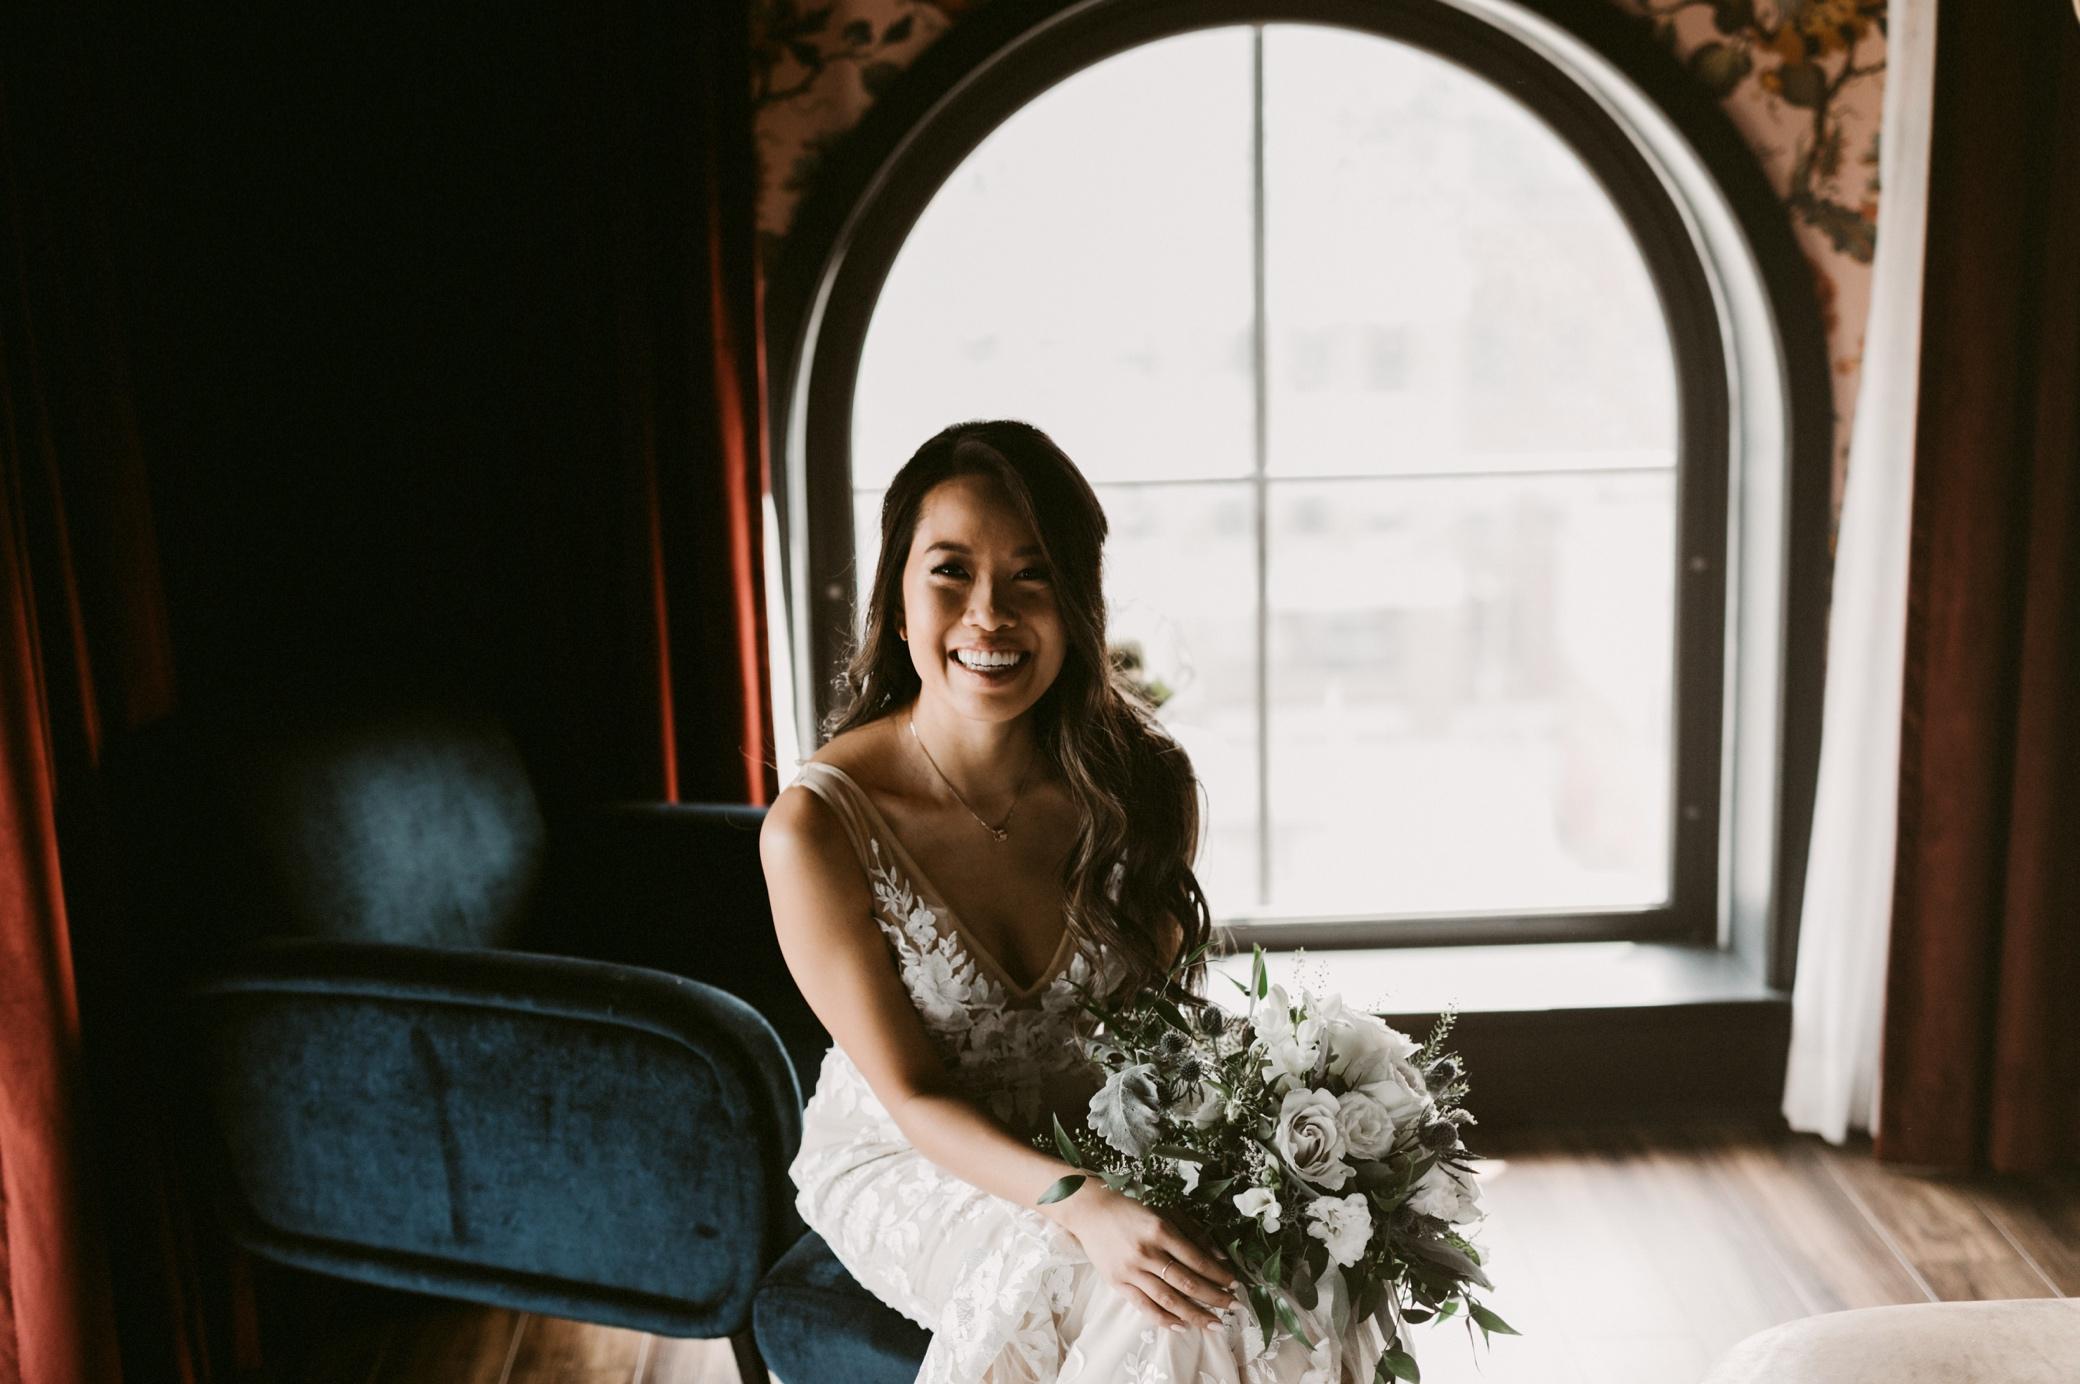 020_The Broadview Hotel Wedding (129 of 913).jpg